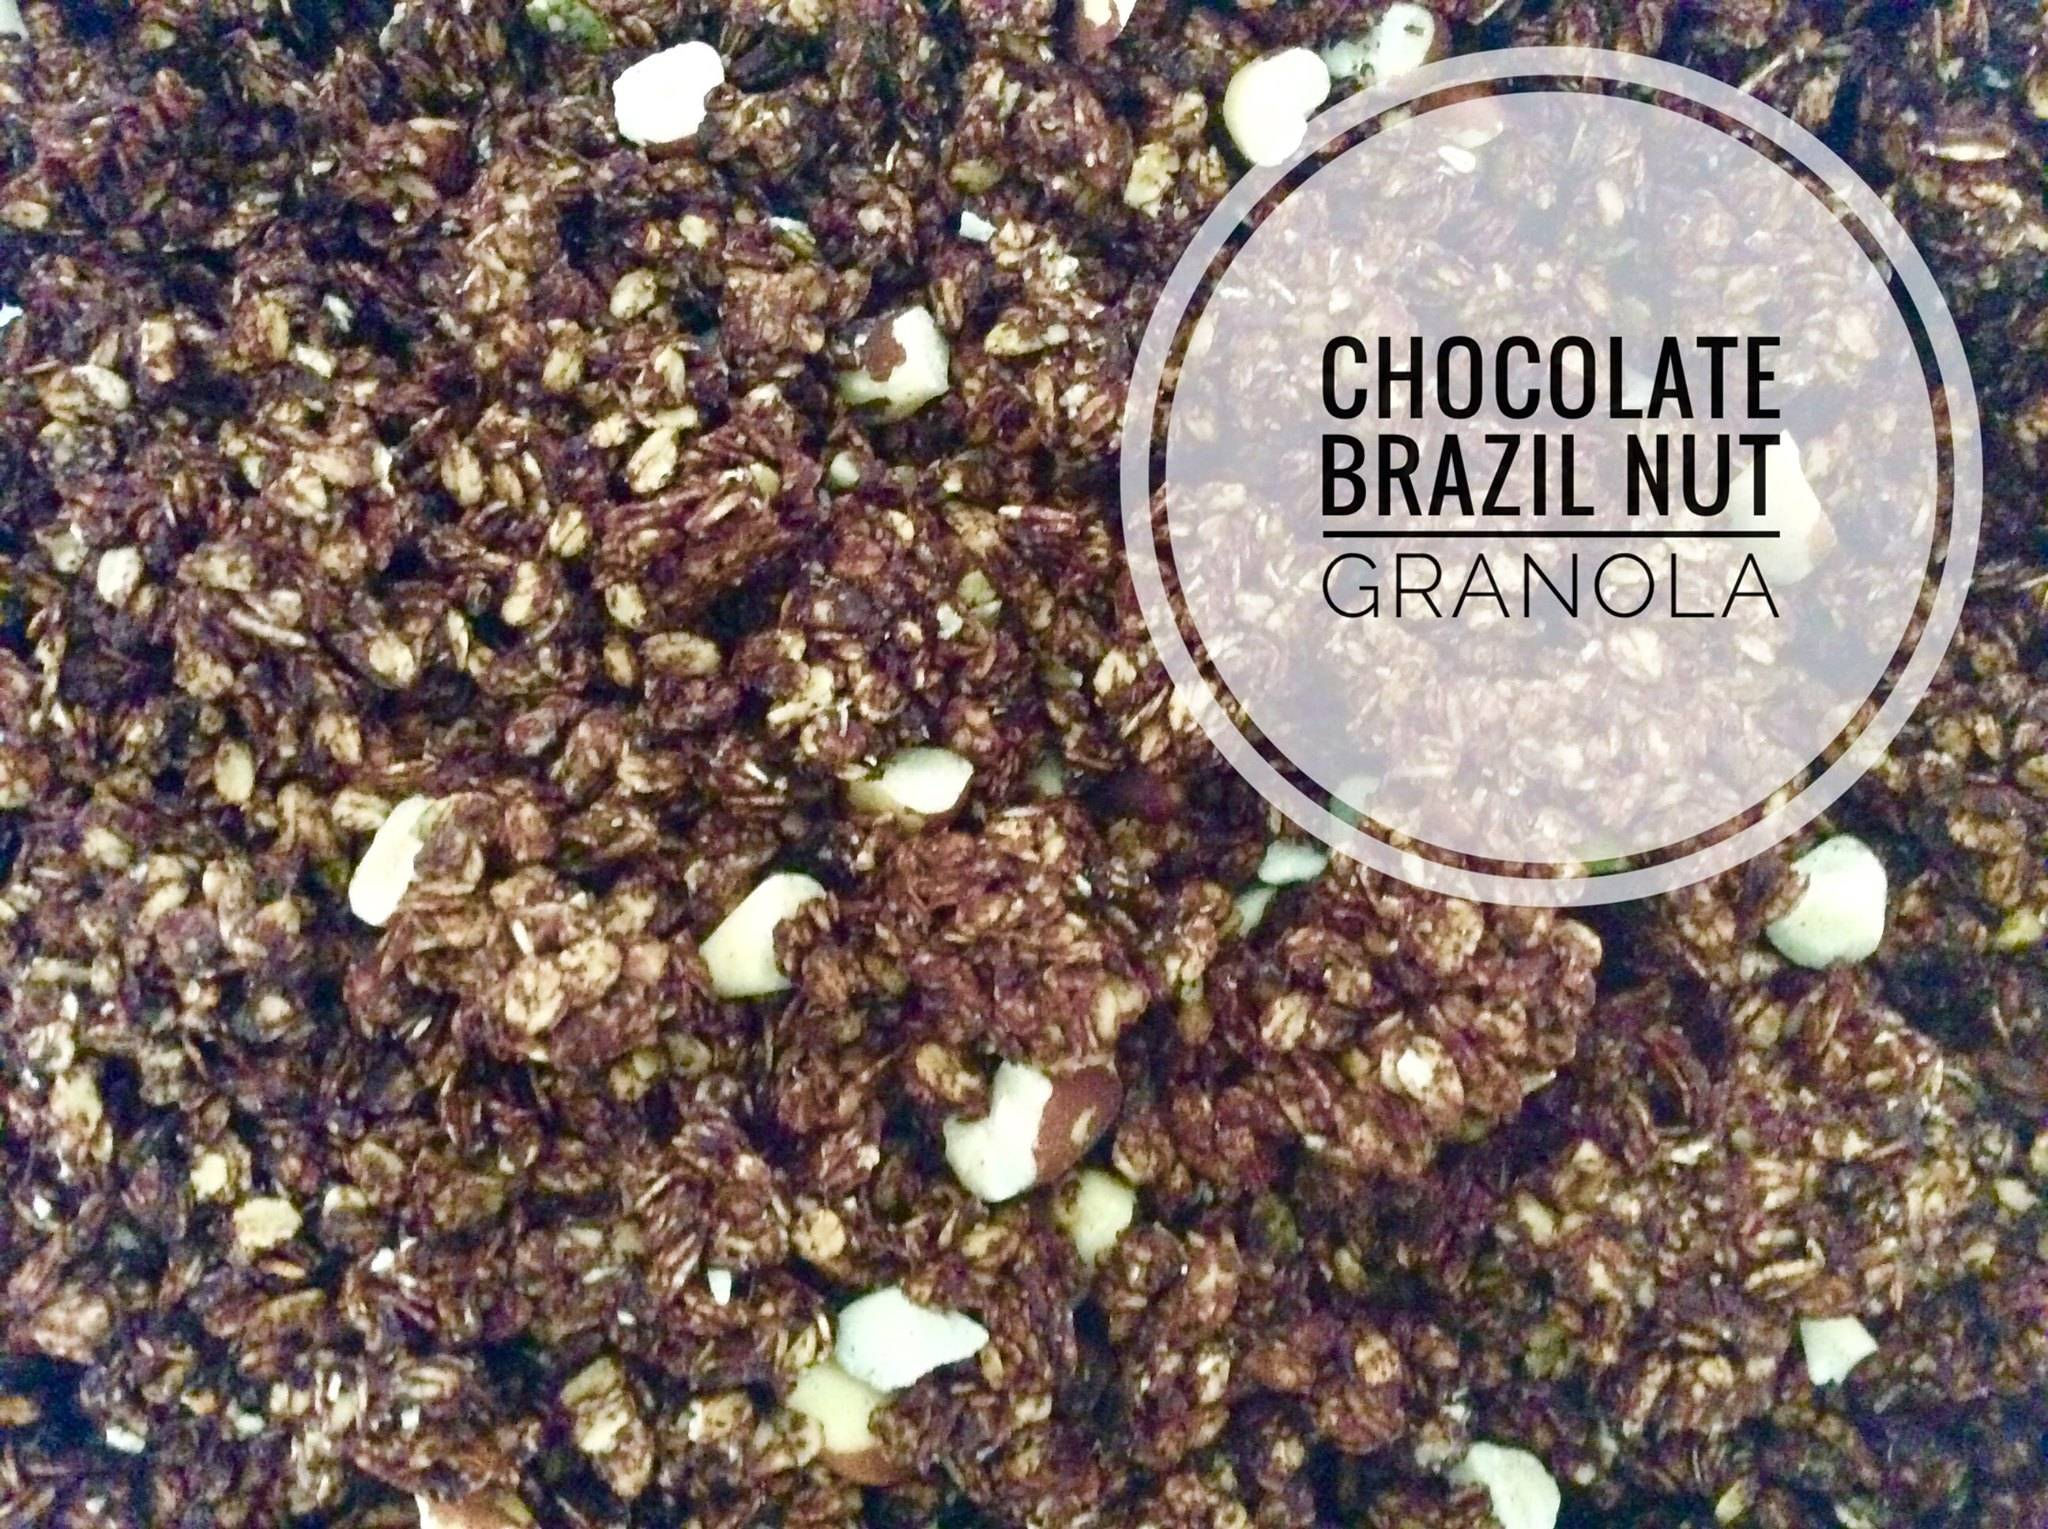 Green's Chocolate Brazil Nut Granola